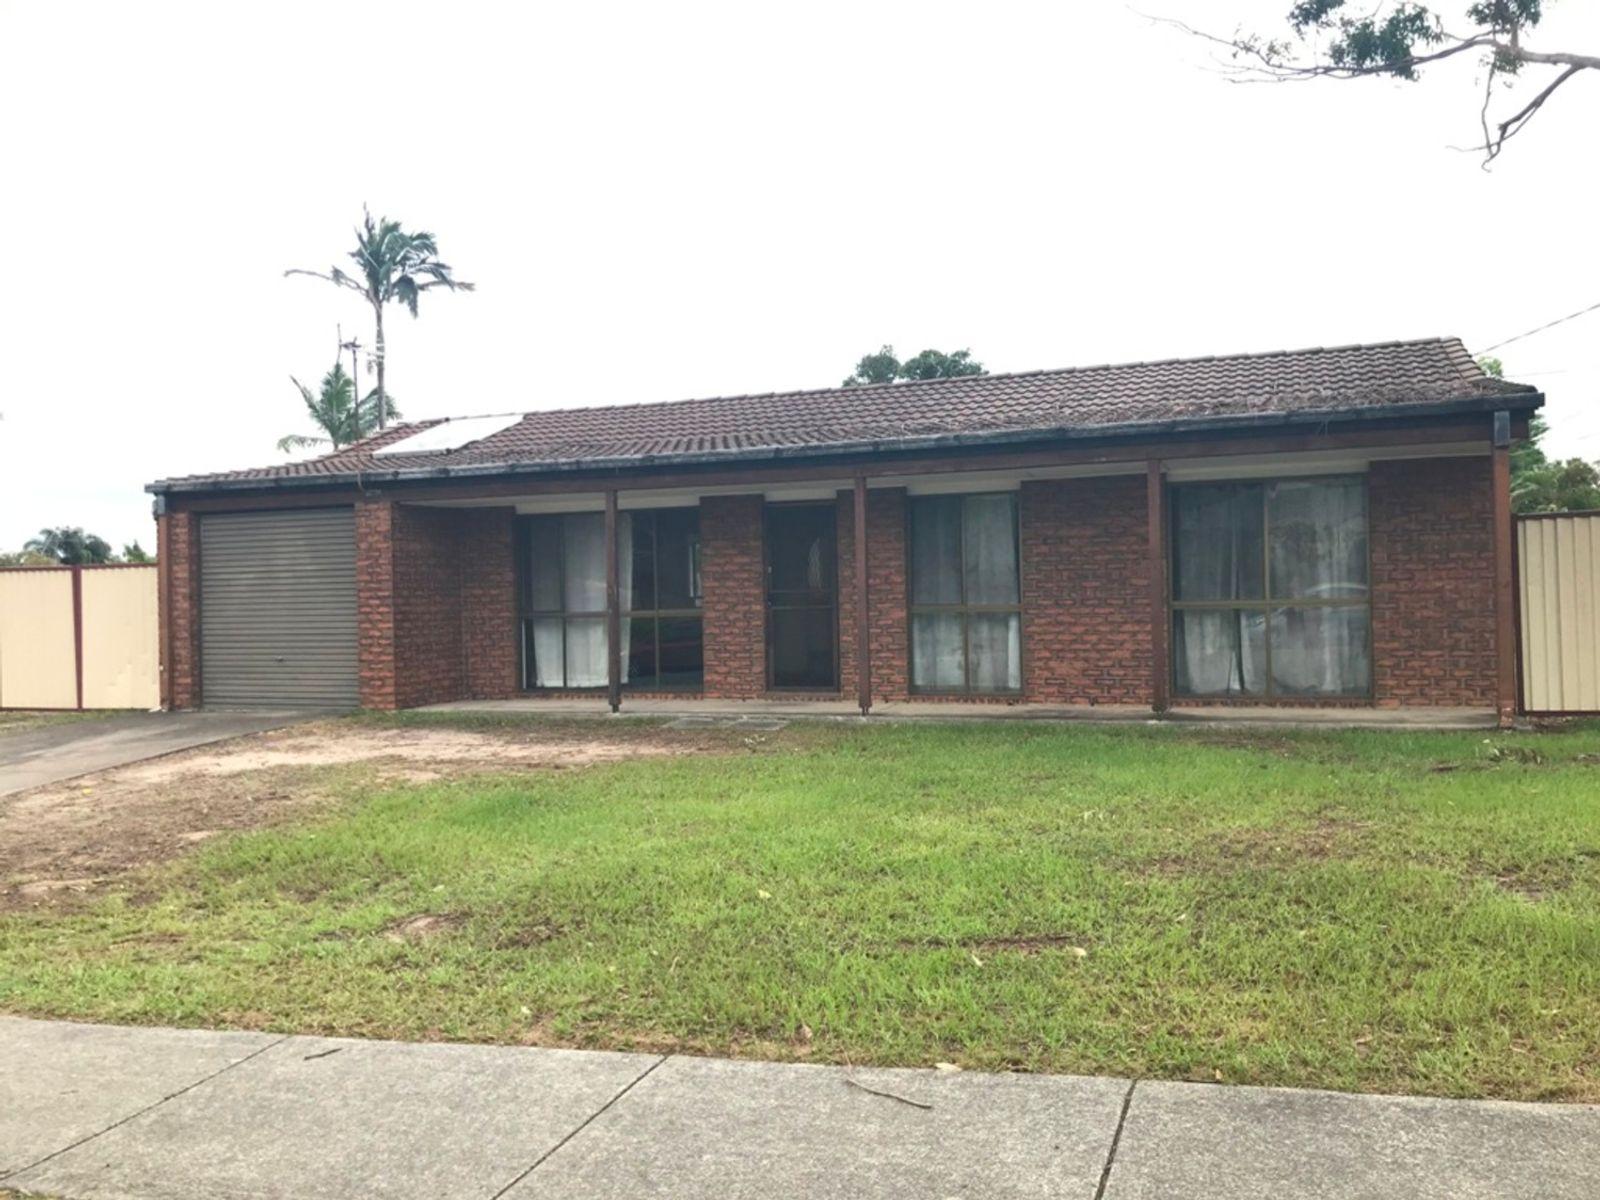 17 Ammons Street, Browns Plains, QLD 4118